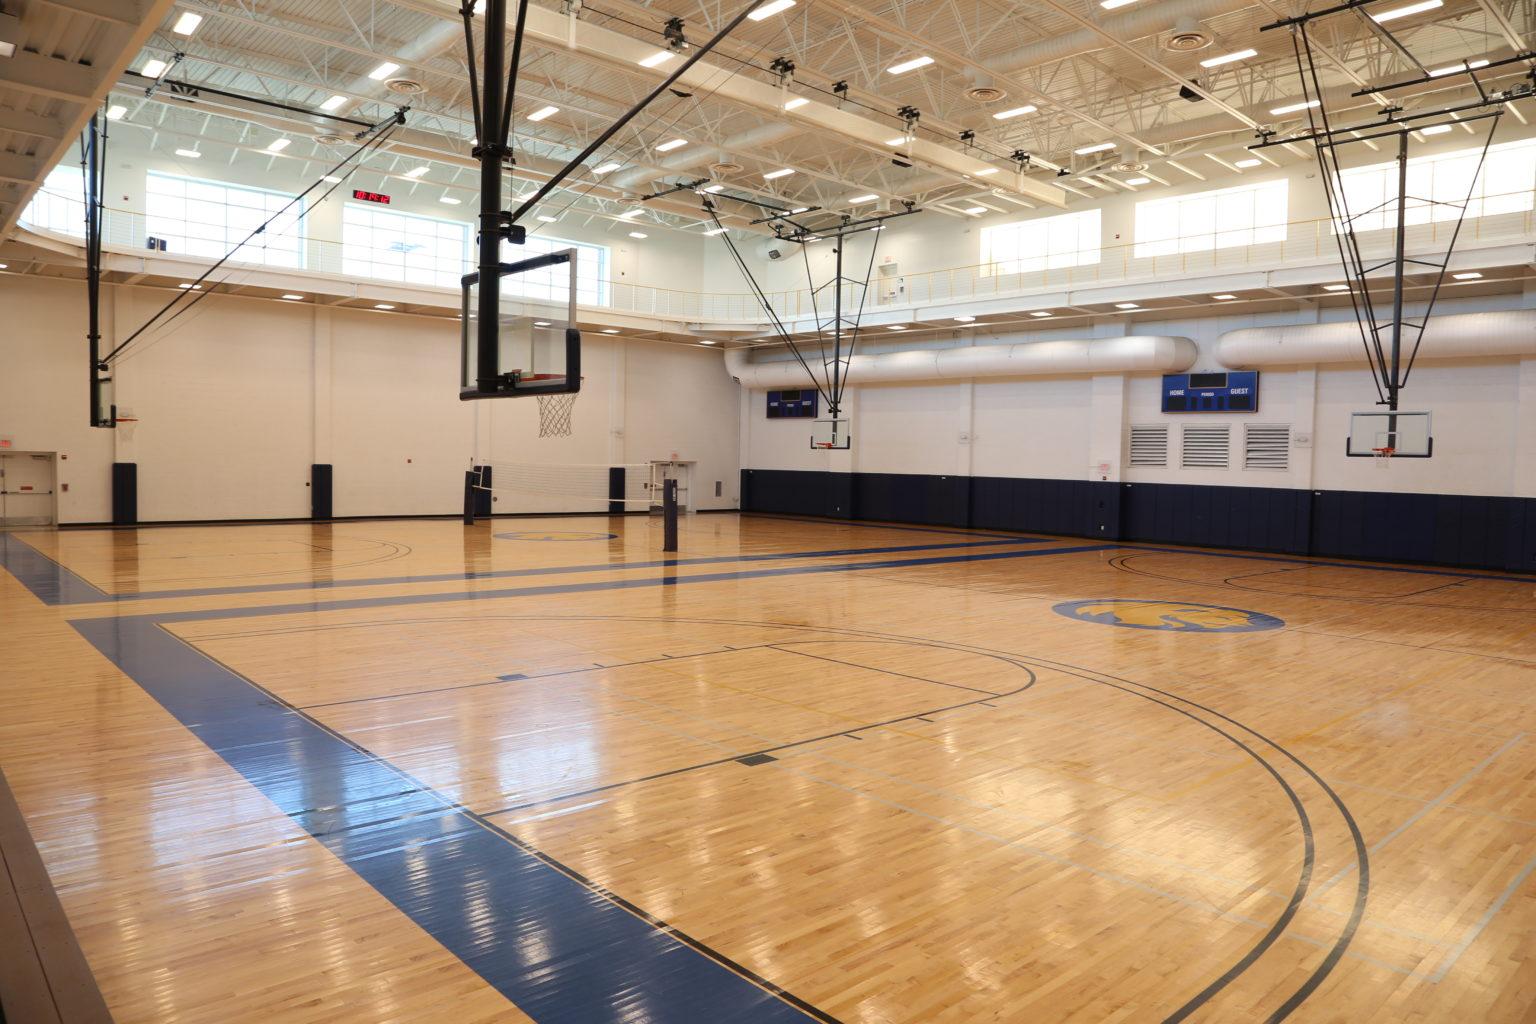 Morris Recreation Center's basketball court.